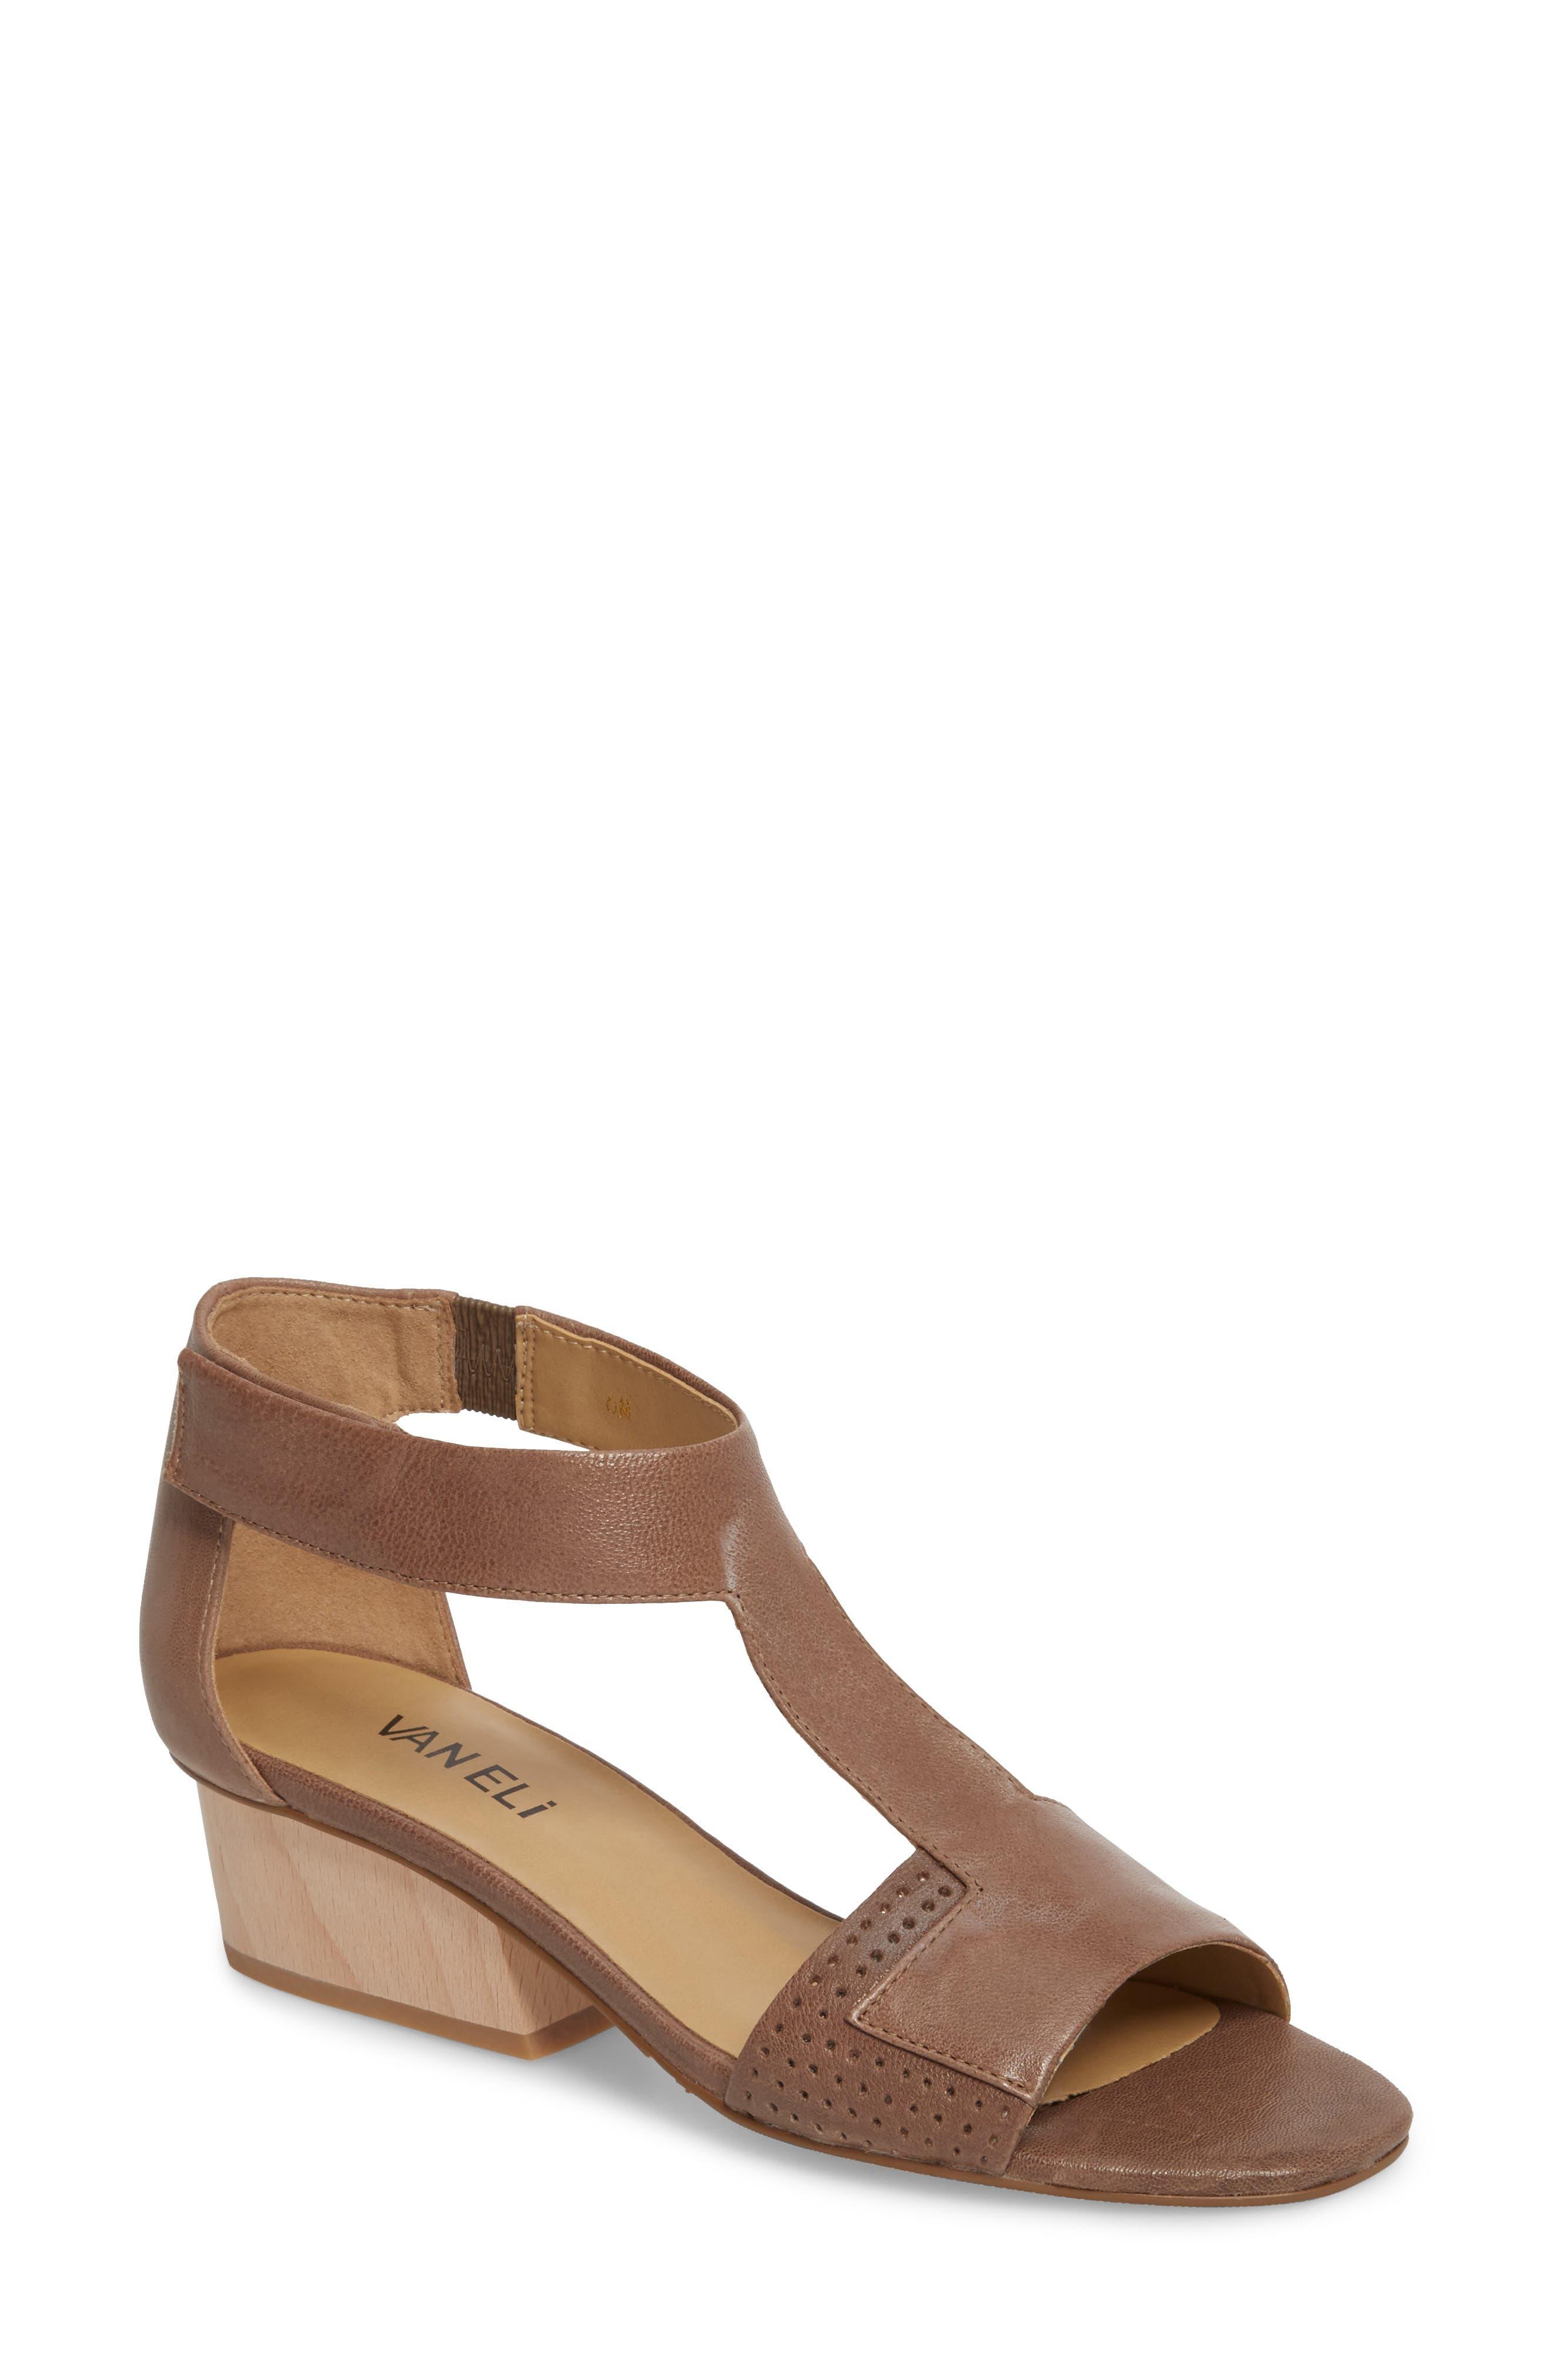 VANELI, Calyx Block Heel Sandal, Main thumbnail 1, color, STONE LEATHER